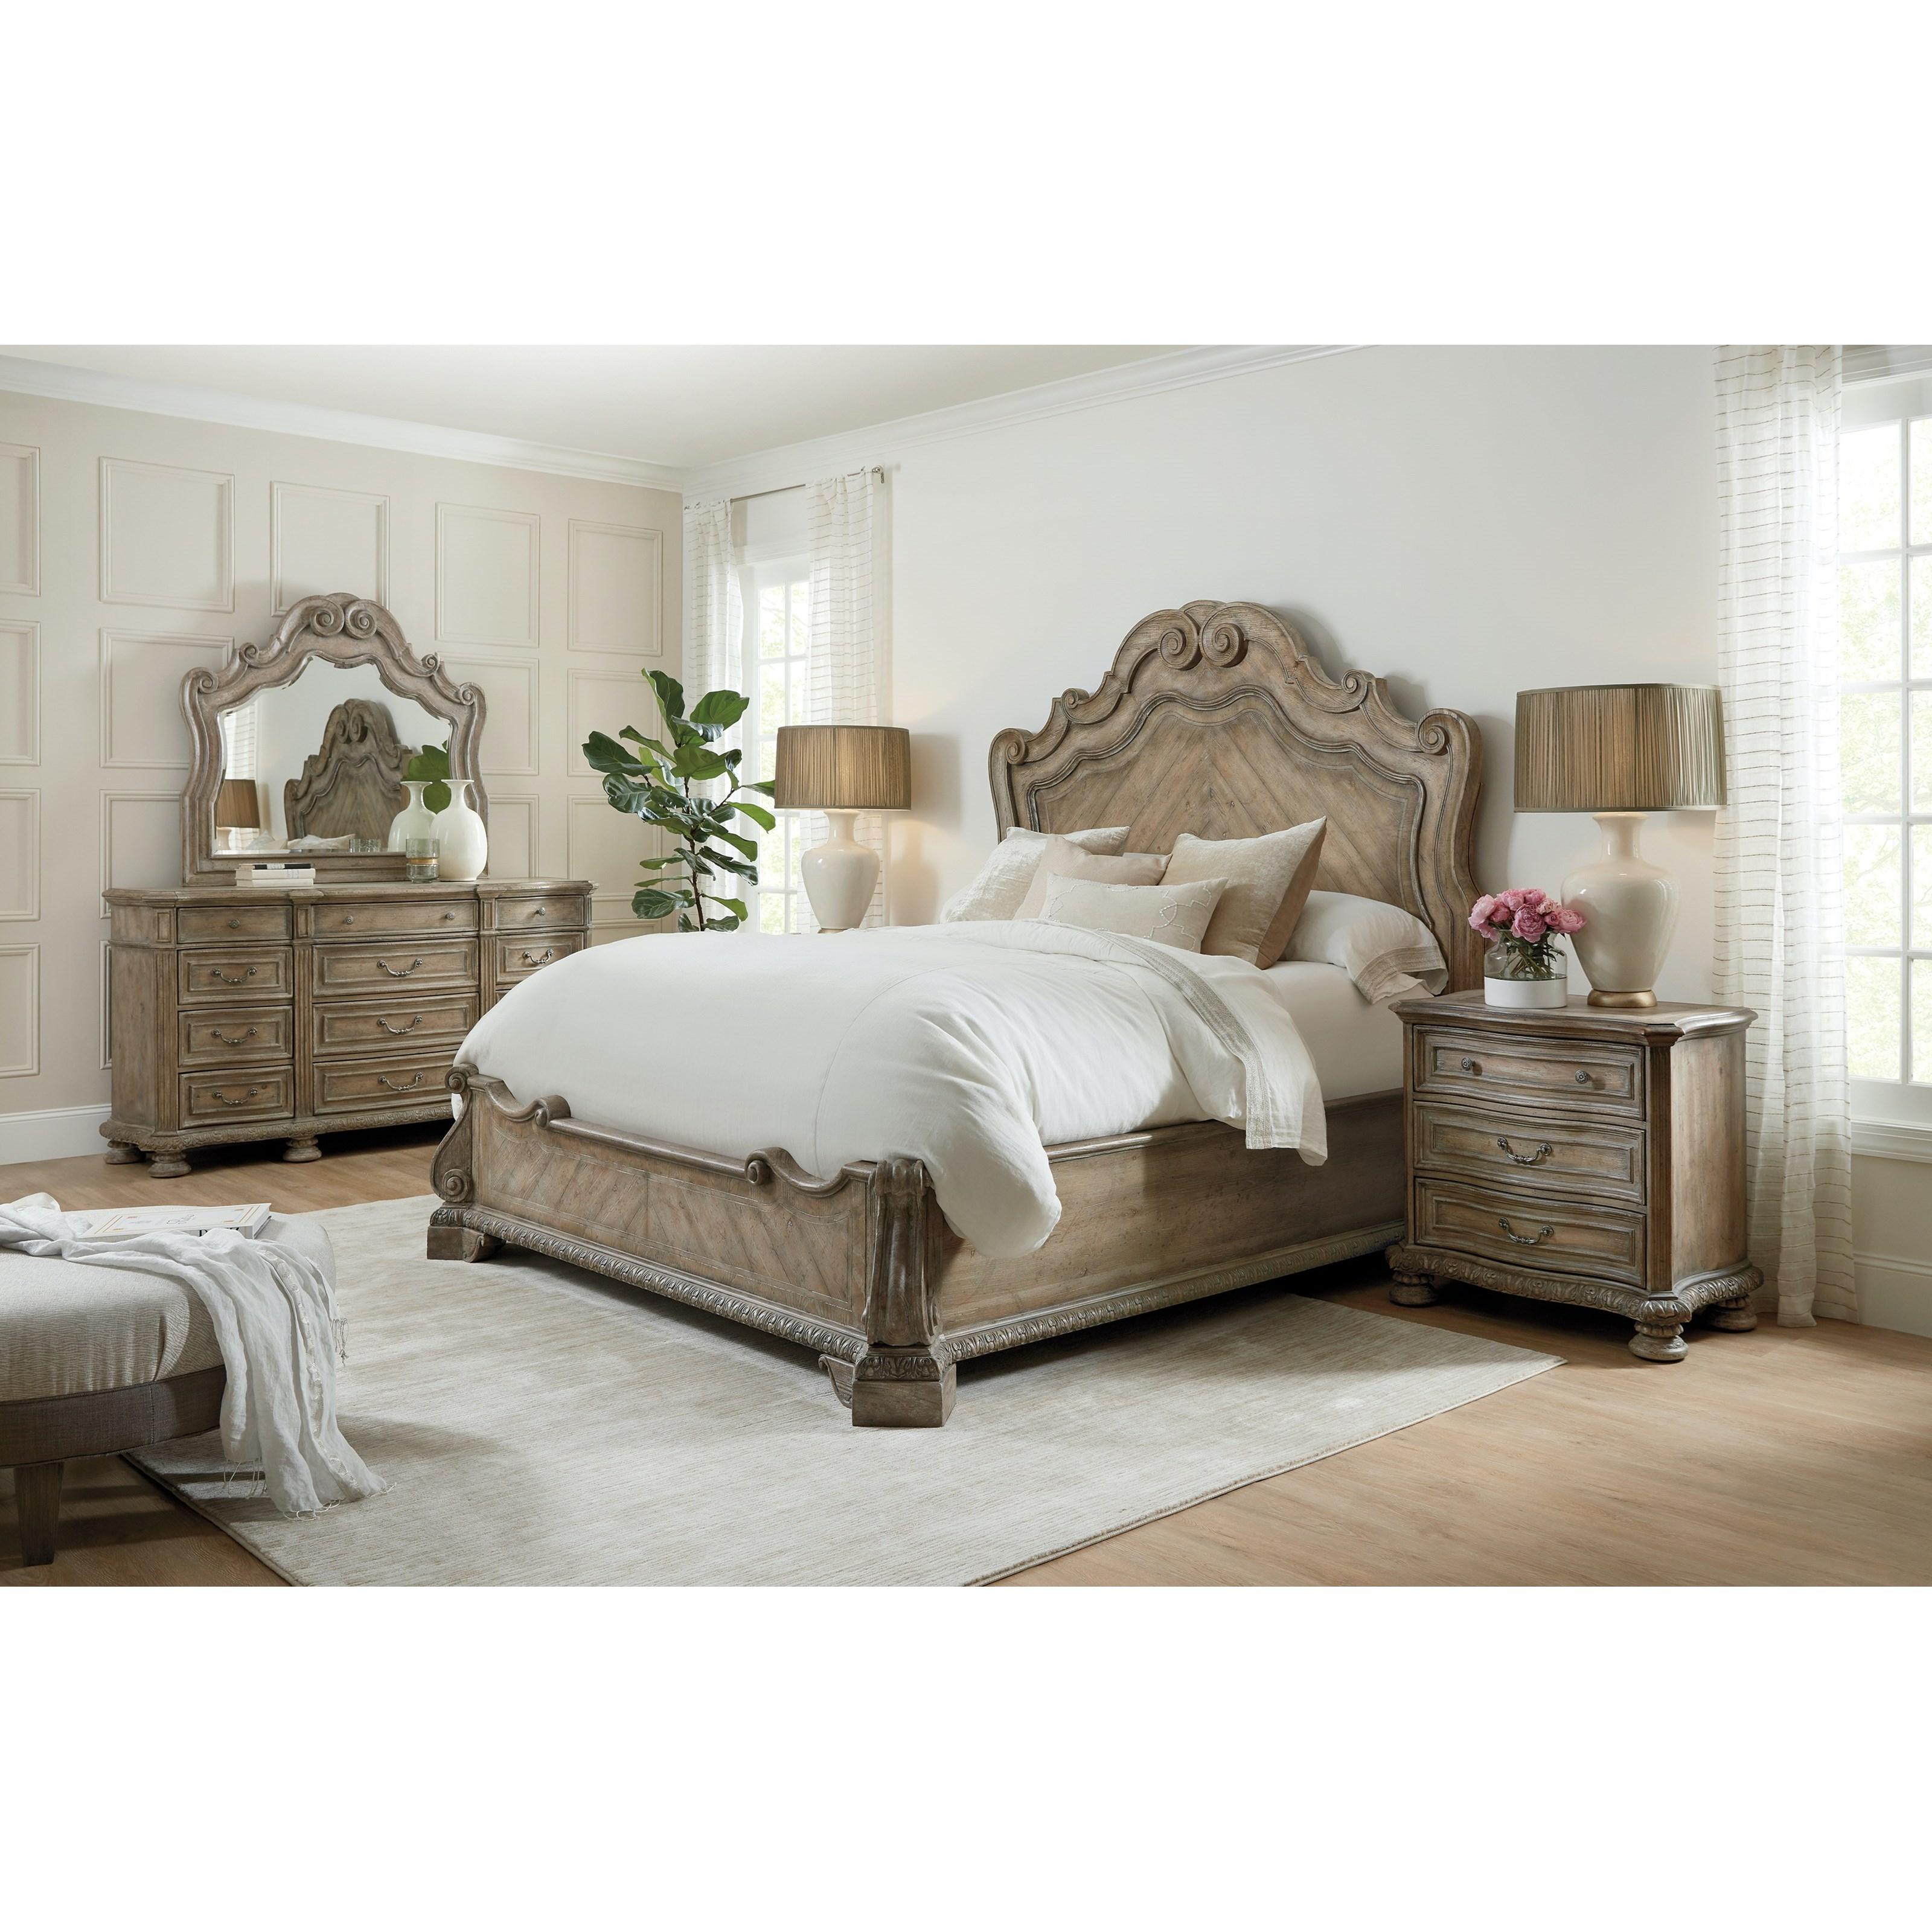 Castella King Bedroom Group by Hooker Furniture at Miller Waldrop Furniture and Decor